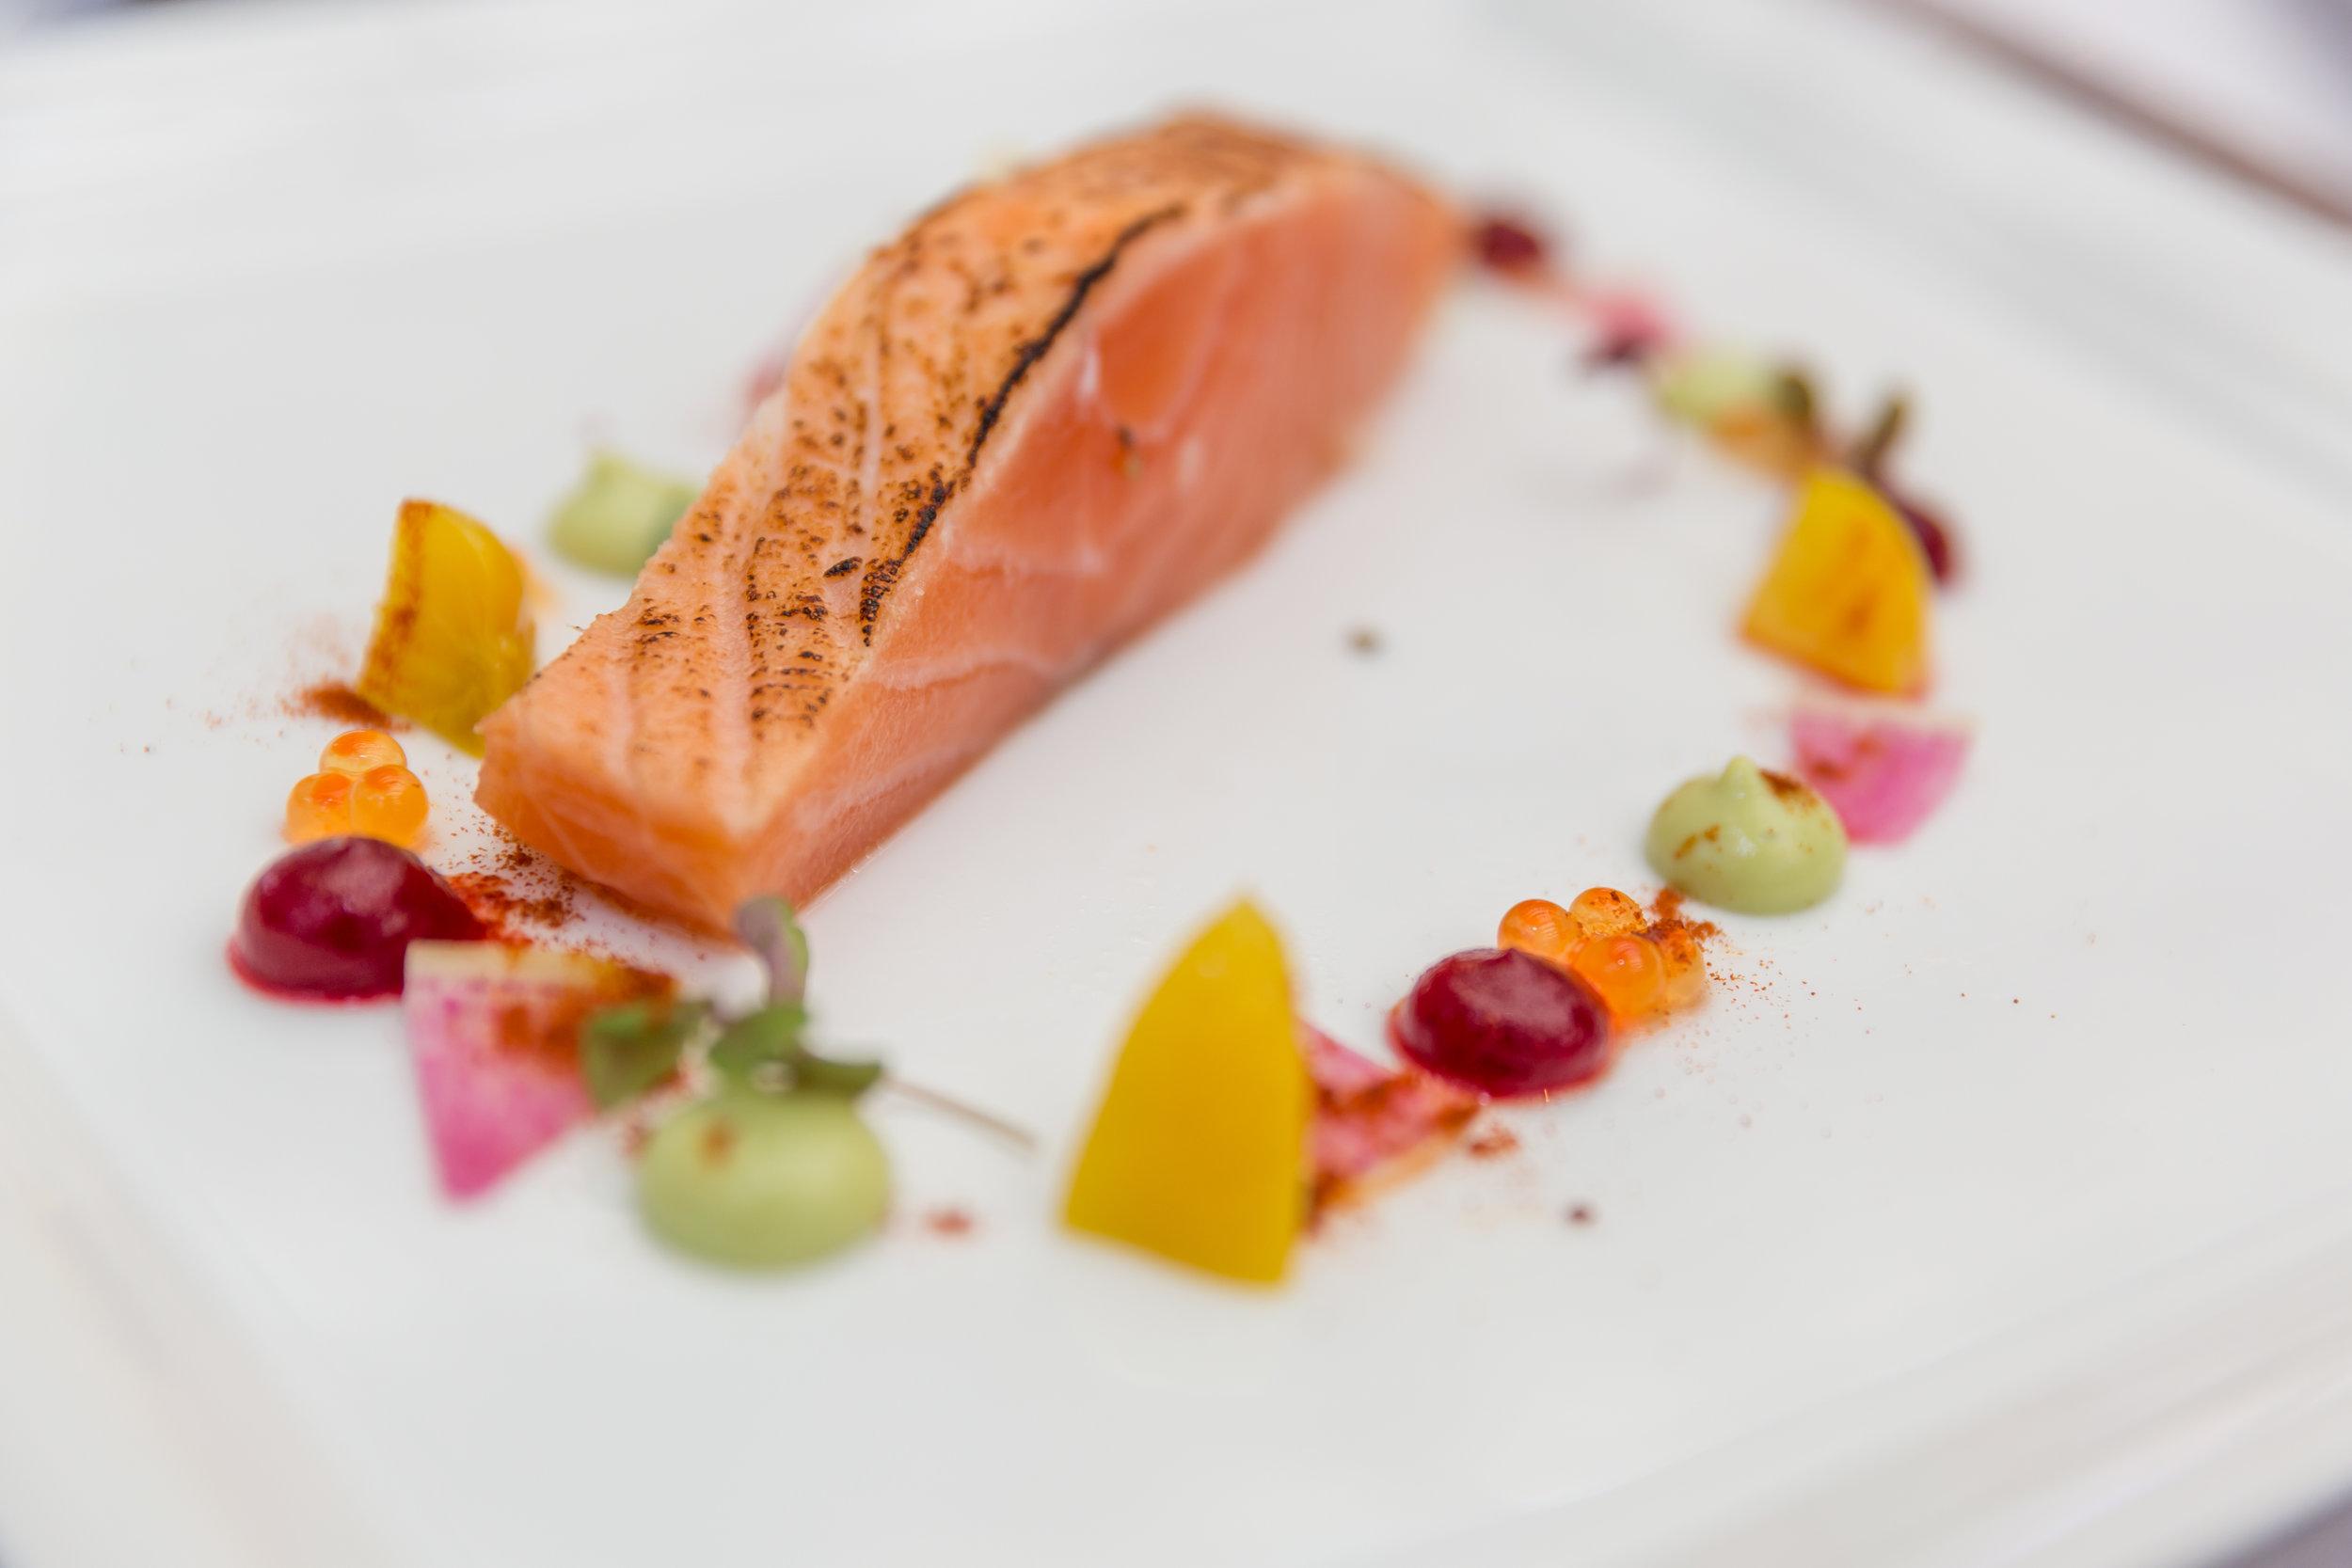 grilled-salmon-food-photo-sydney-food-photographer